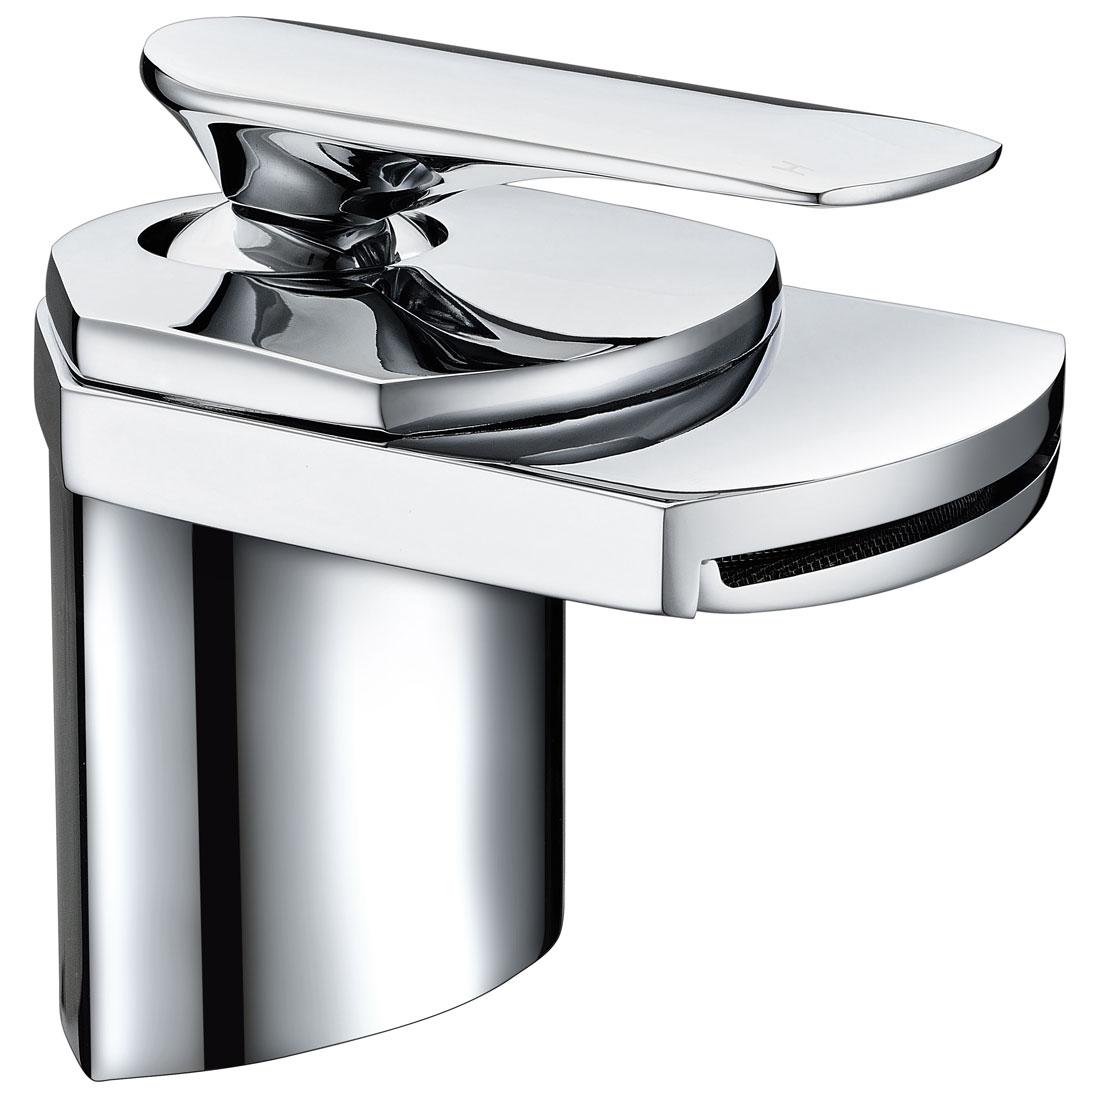 JTP Gant Basin Mixer Tap with Click Clack Waste Single Handle - Chrome